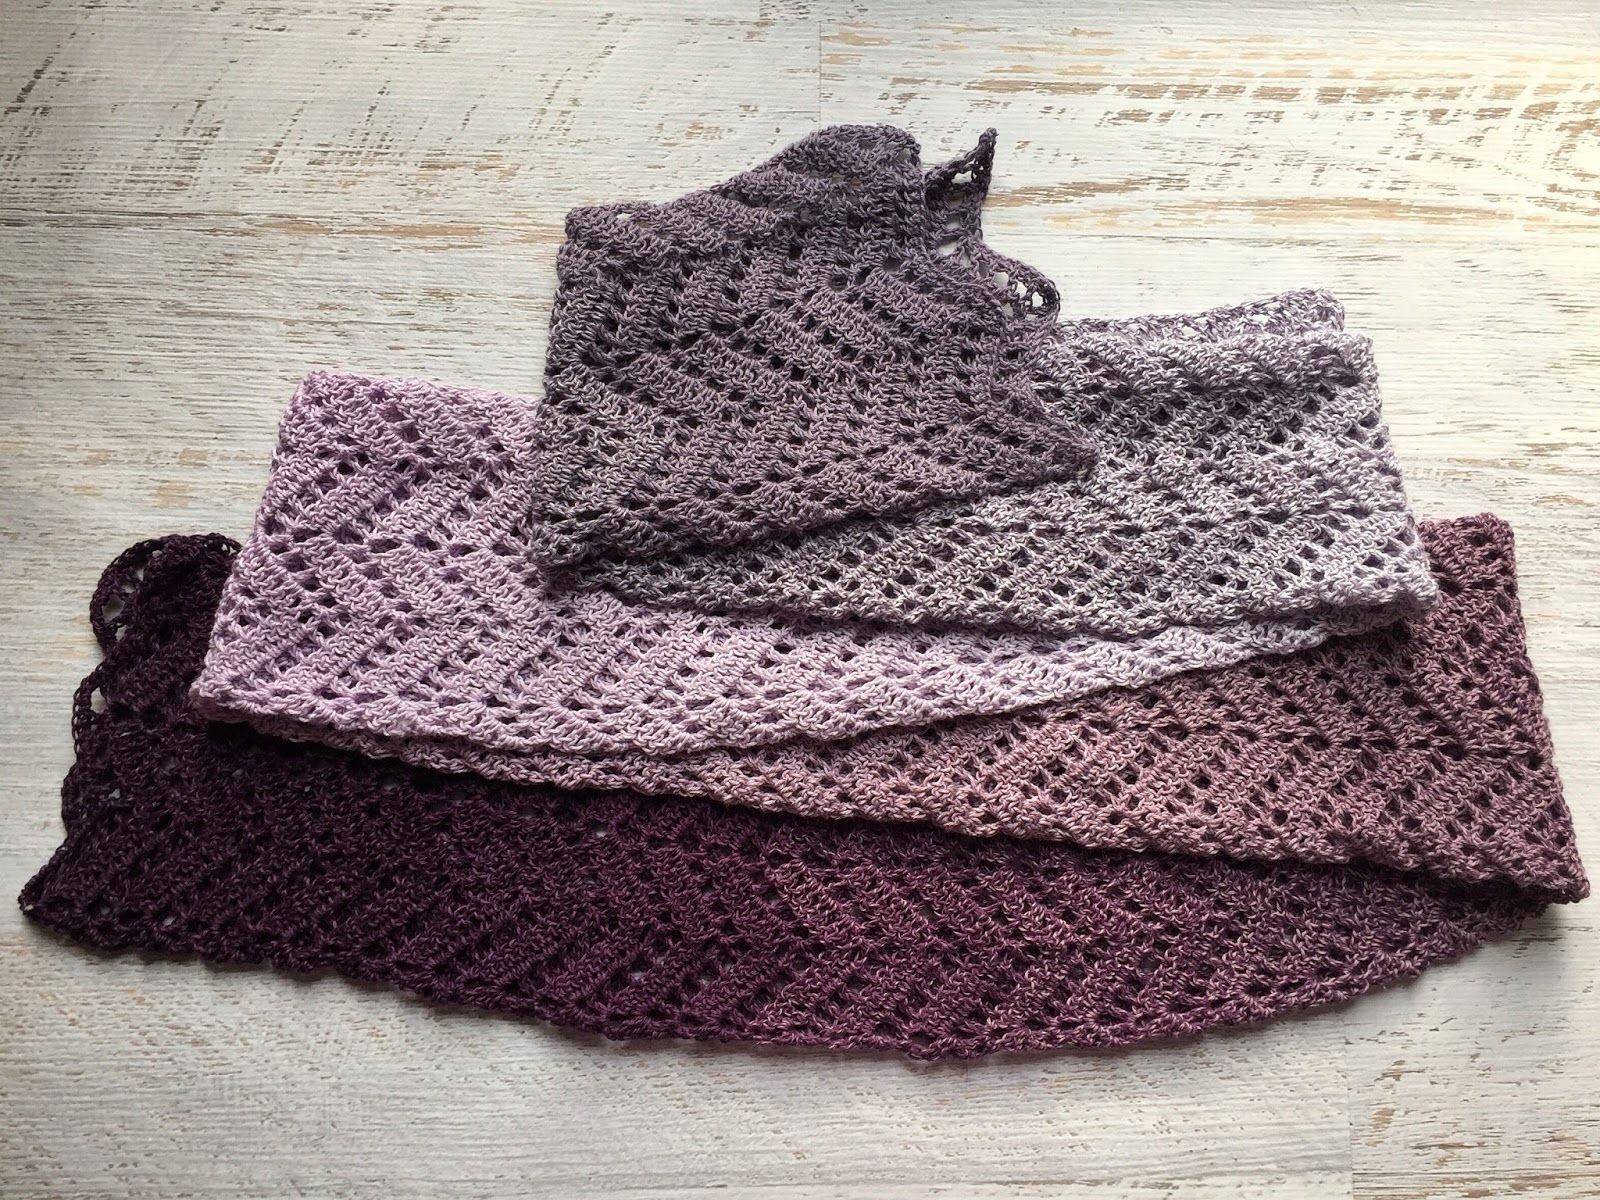 Scheepjes Whirl Yarn Review 50 Shades Crochet